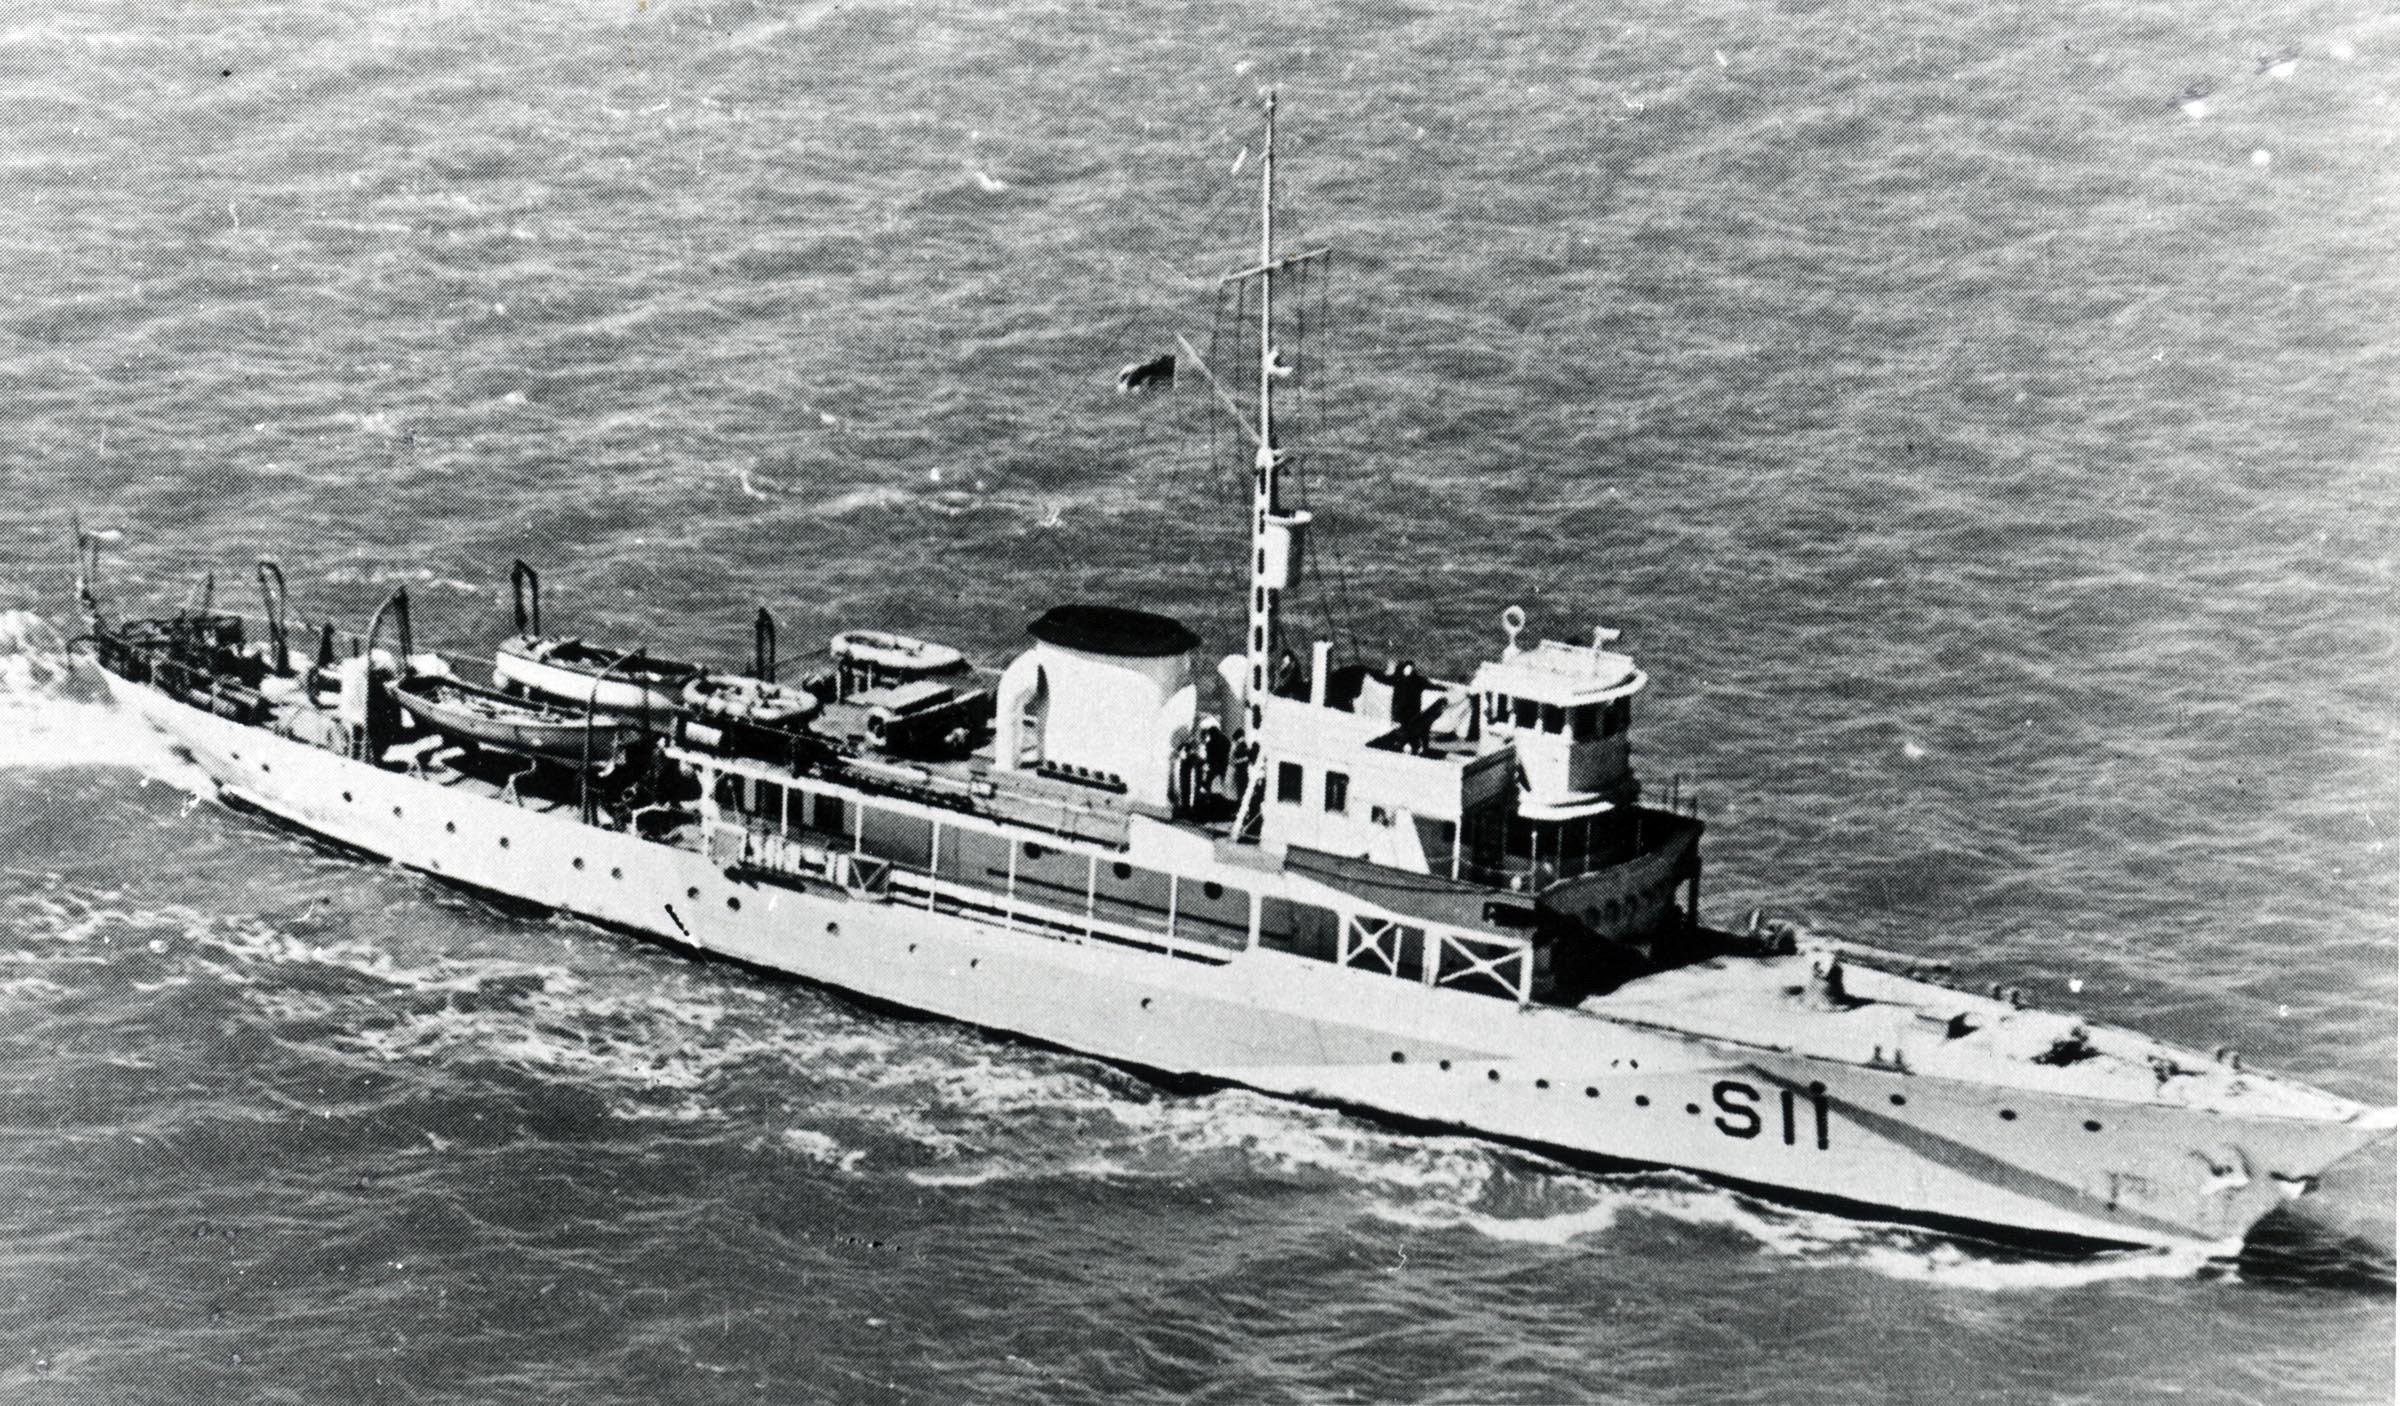 HMCS VISON